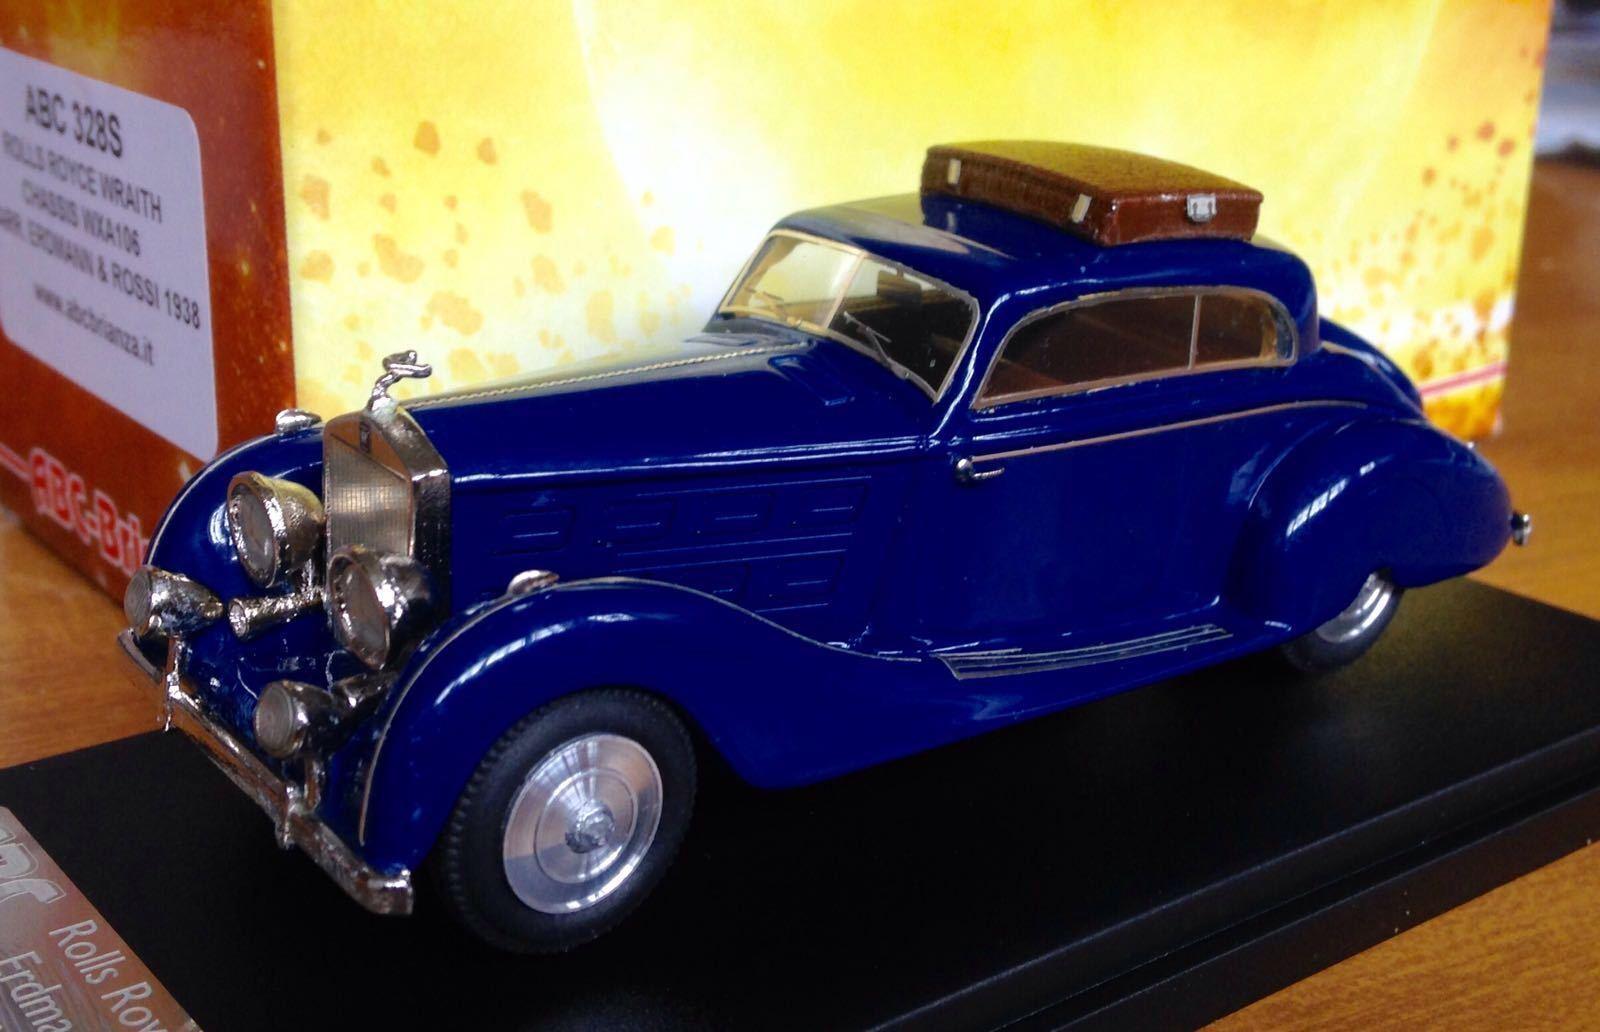 ABC Brianza 328 - ROLLS ROYCE WRAITH CHASSIS WXA106 ERDMANN & ROSSI 1938 1 43